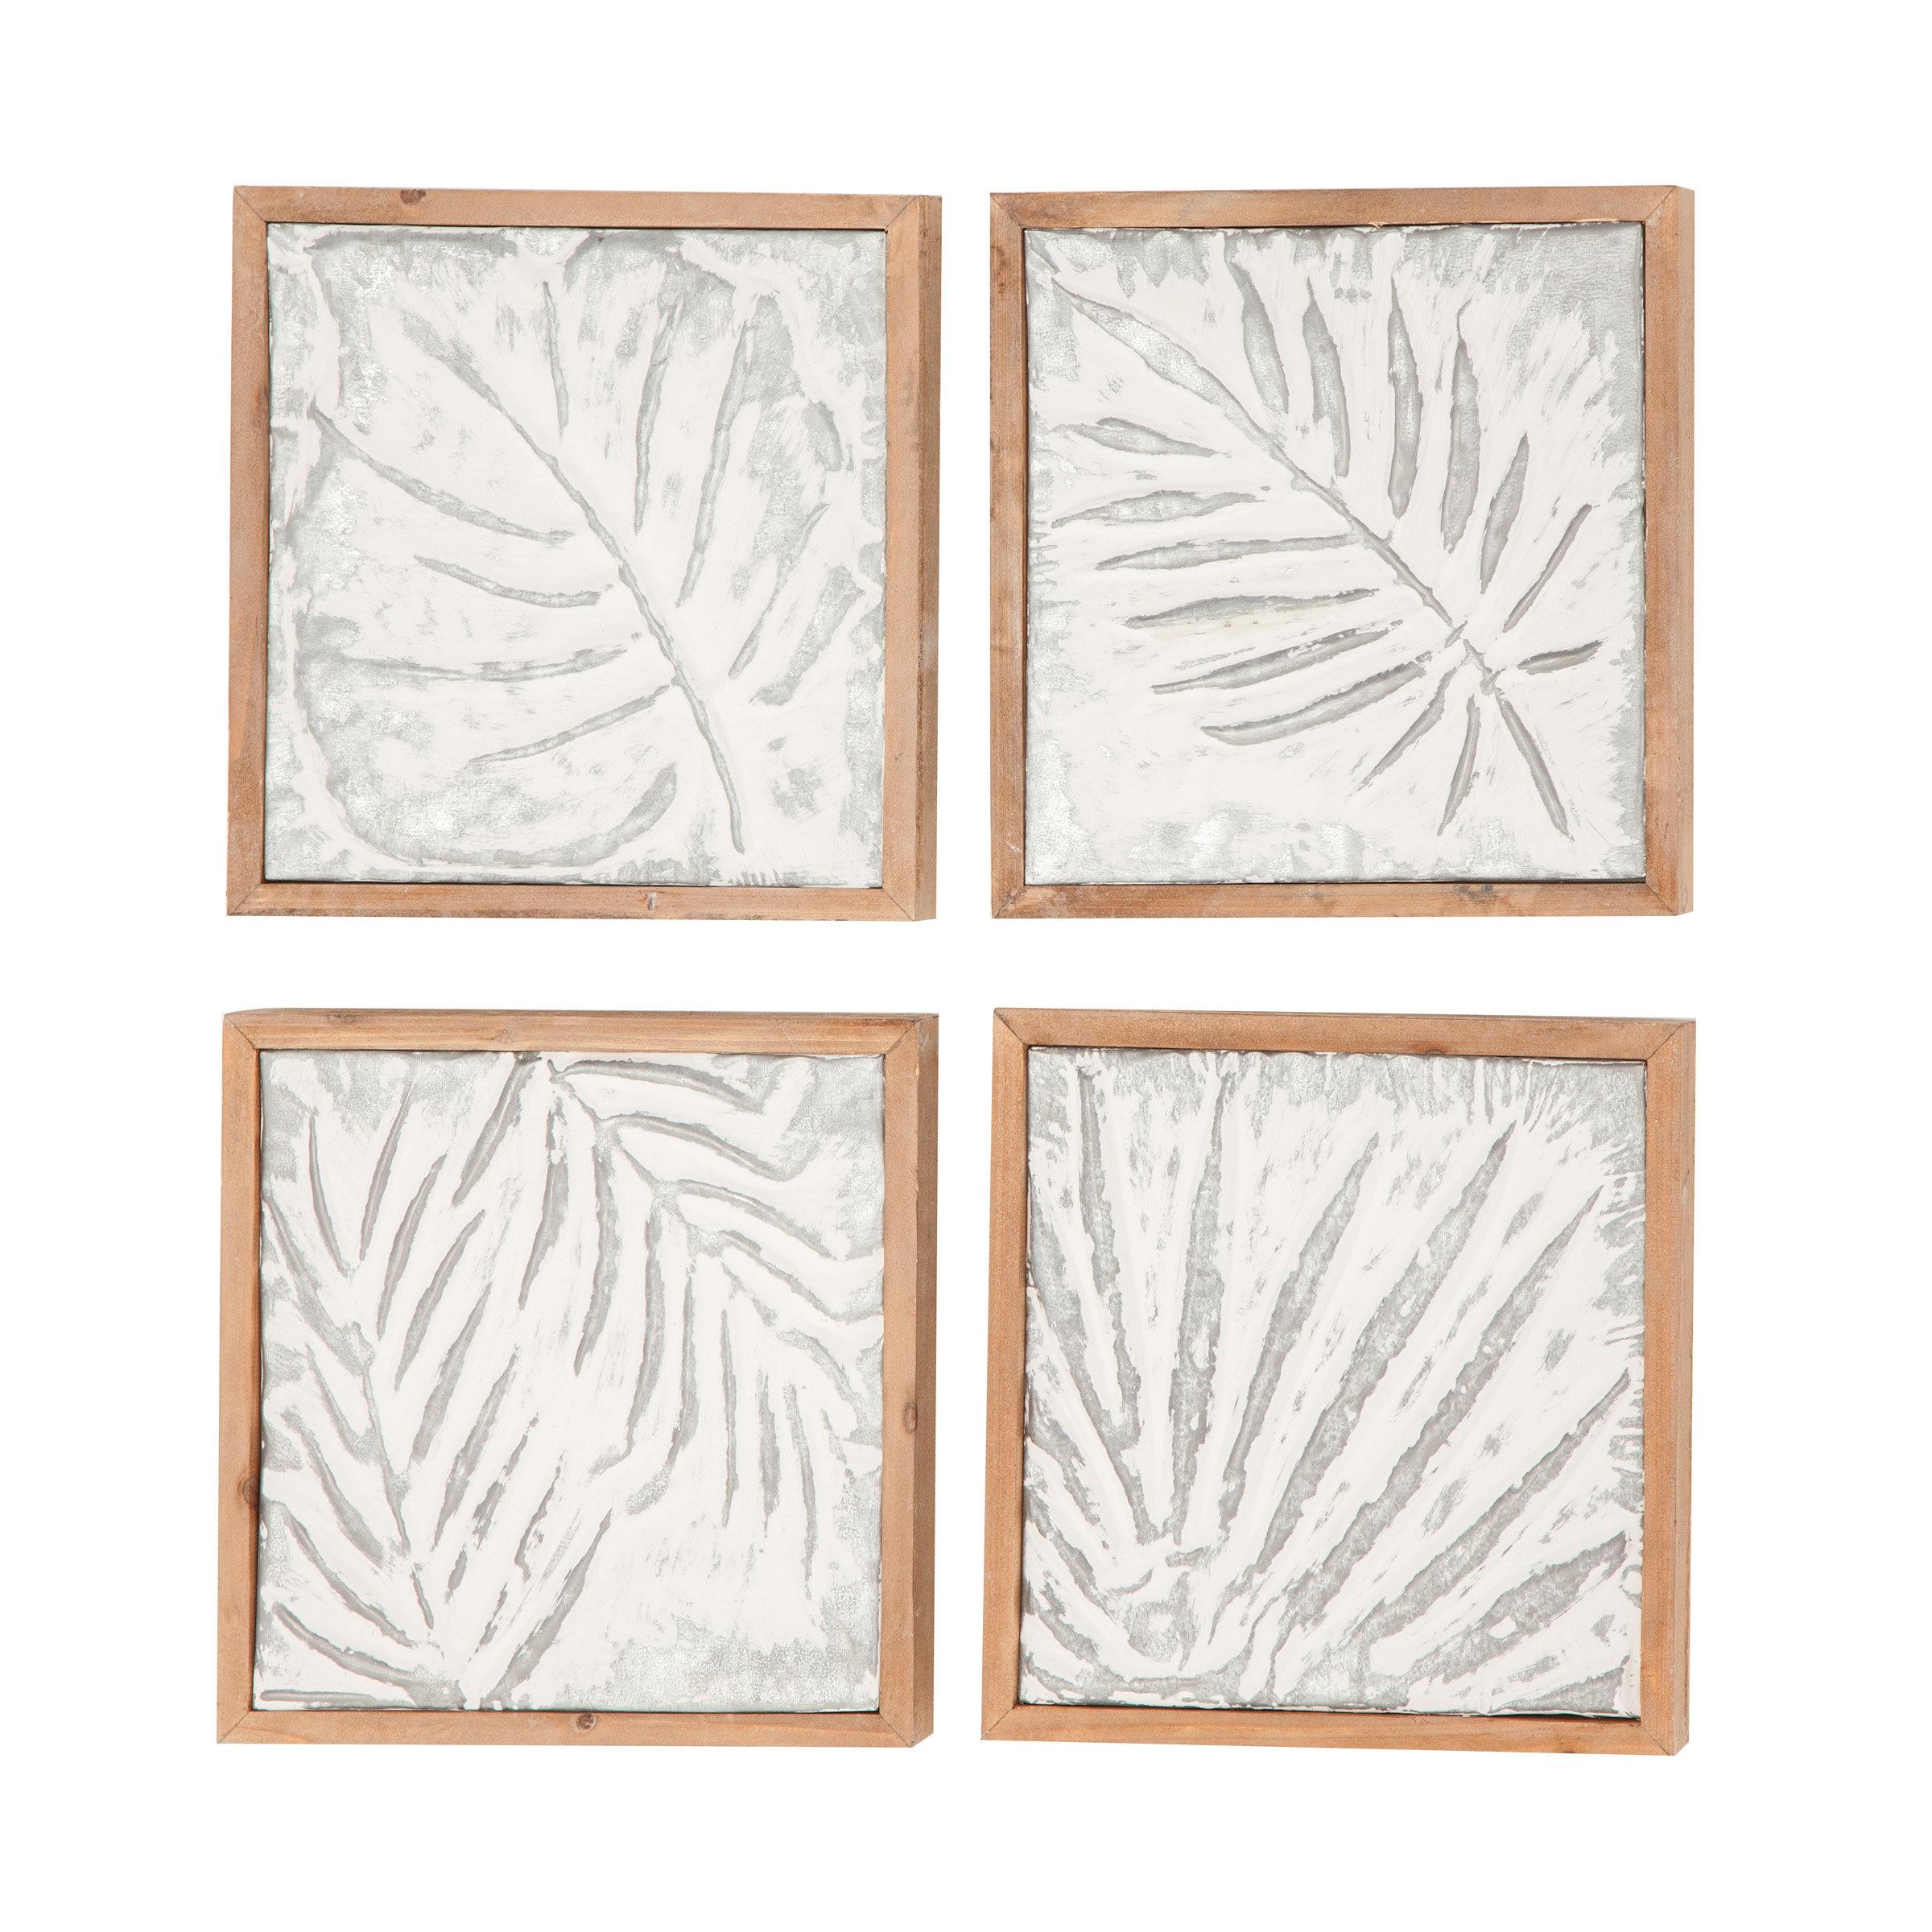 Goodfellow 4 Piece Wood Leaf Wall Decor Set Inside 4 Piece Wall Decor Sets (View 15 of 30)